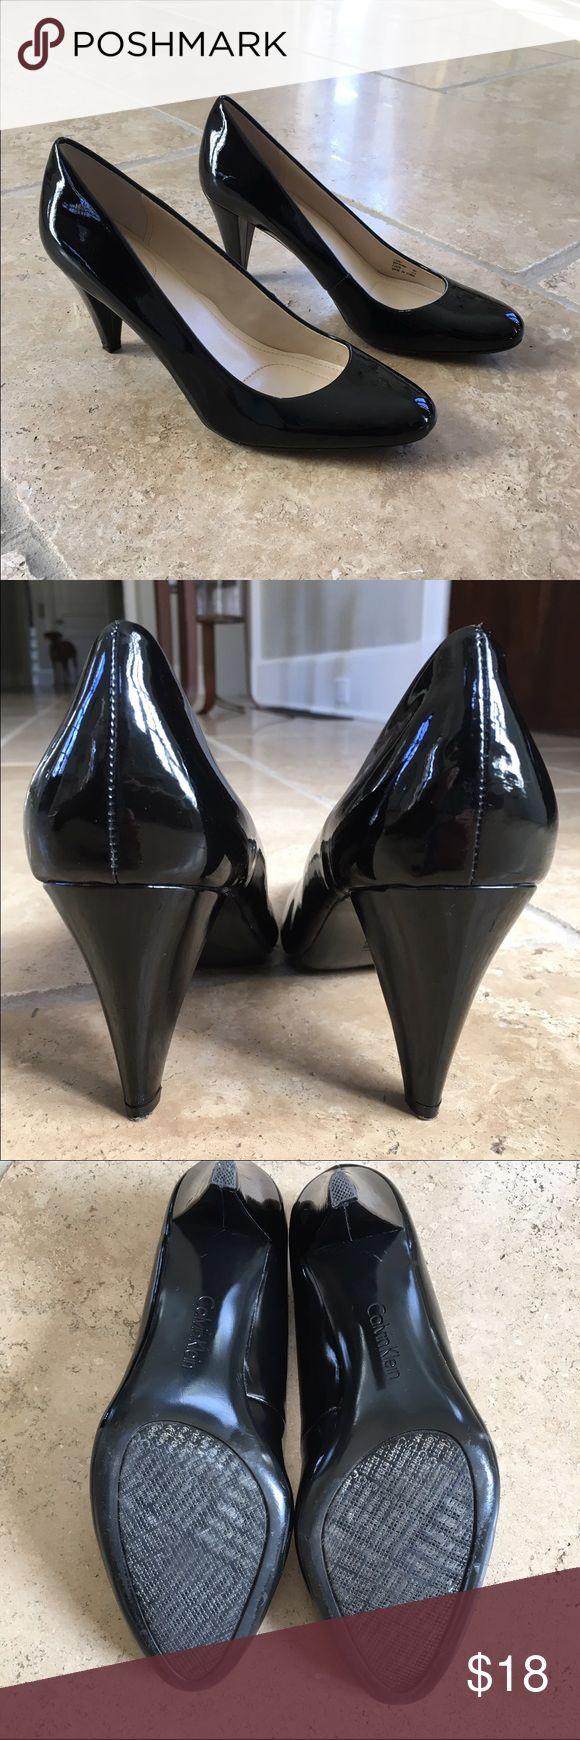 "Calvin Klein Classic Black Patent Pump Bryanna 3"" heel; few scuff marks, not very noticeable when wearing. 8M Calvin Klein Shoes Heels"